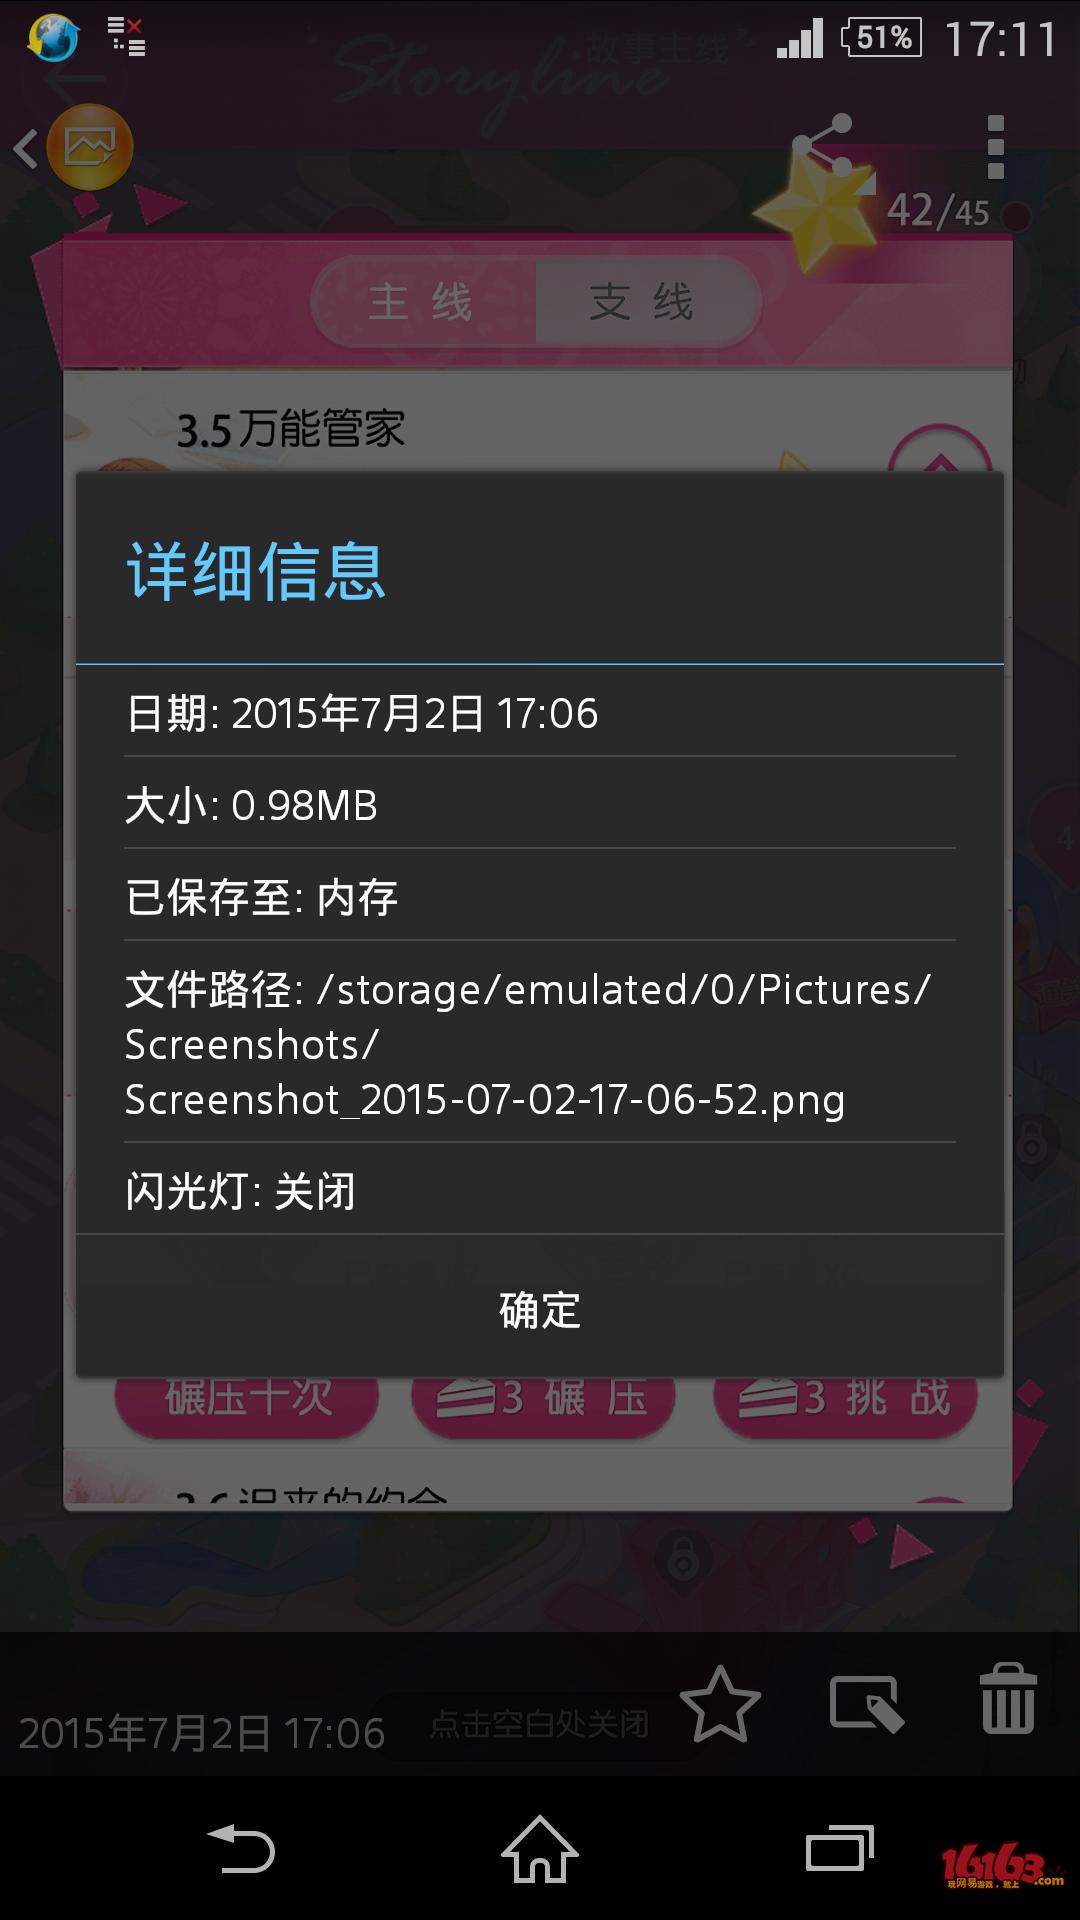 Screenshot_2015-07-02-17-11-08.png